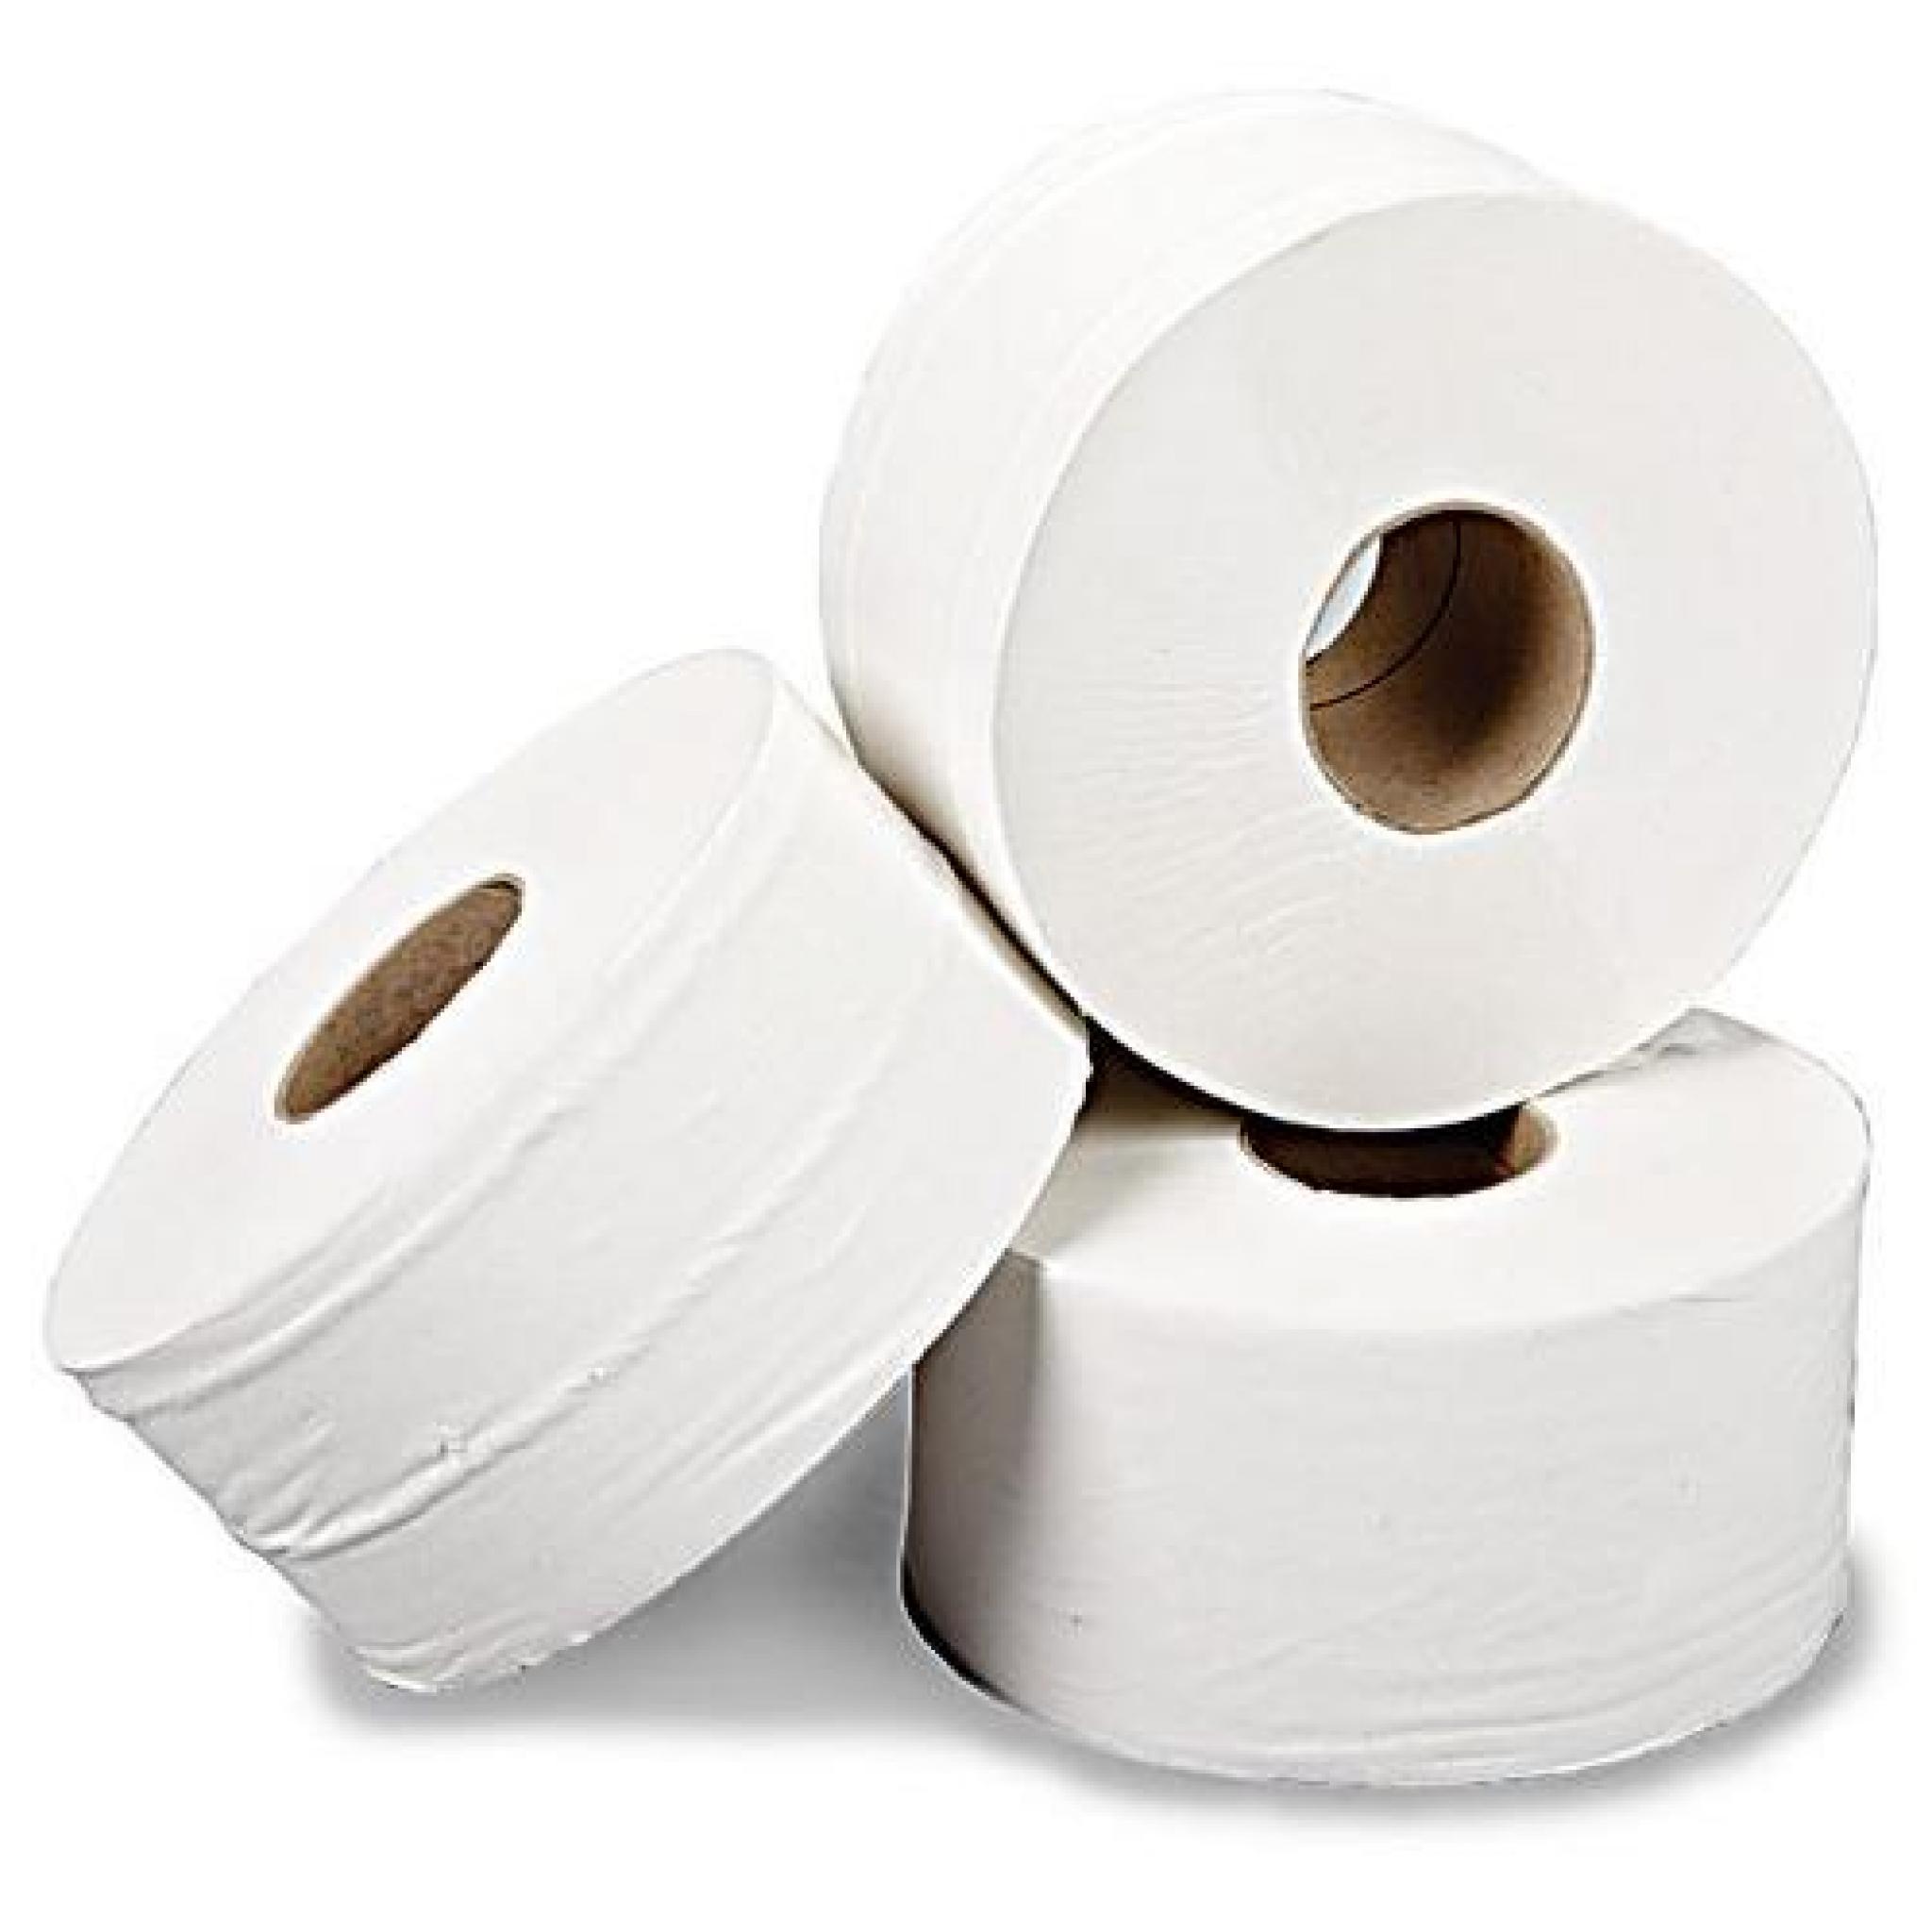 Mini Jumbo Toilet Rolls 150m (76mm Core) Recycled x 24 rolls